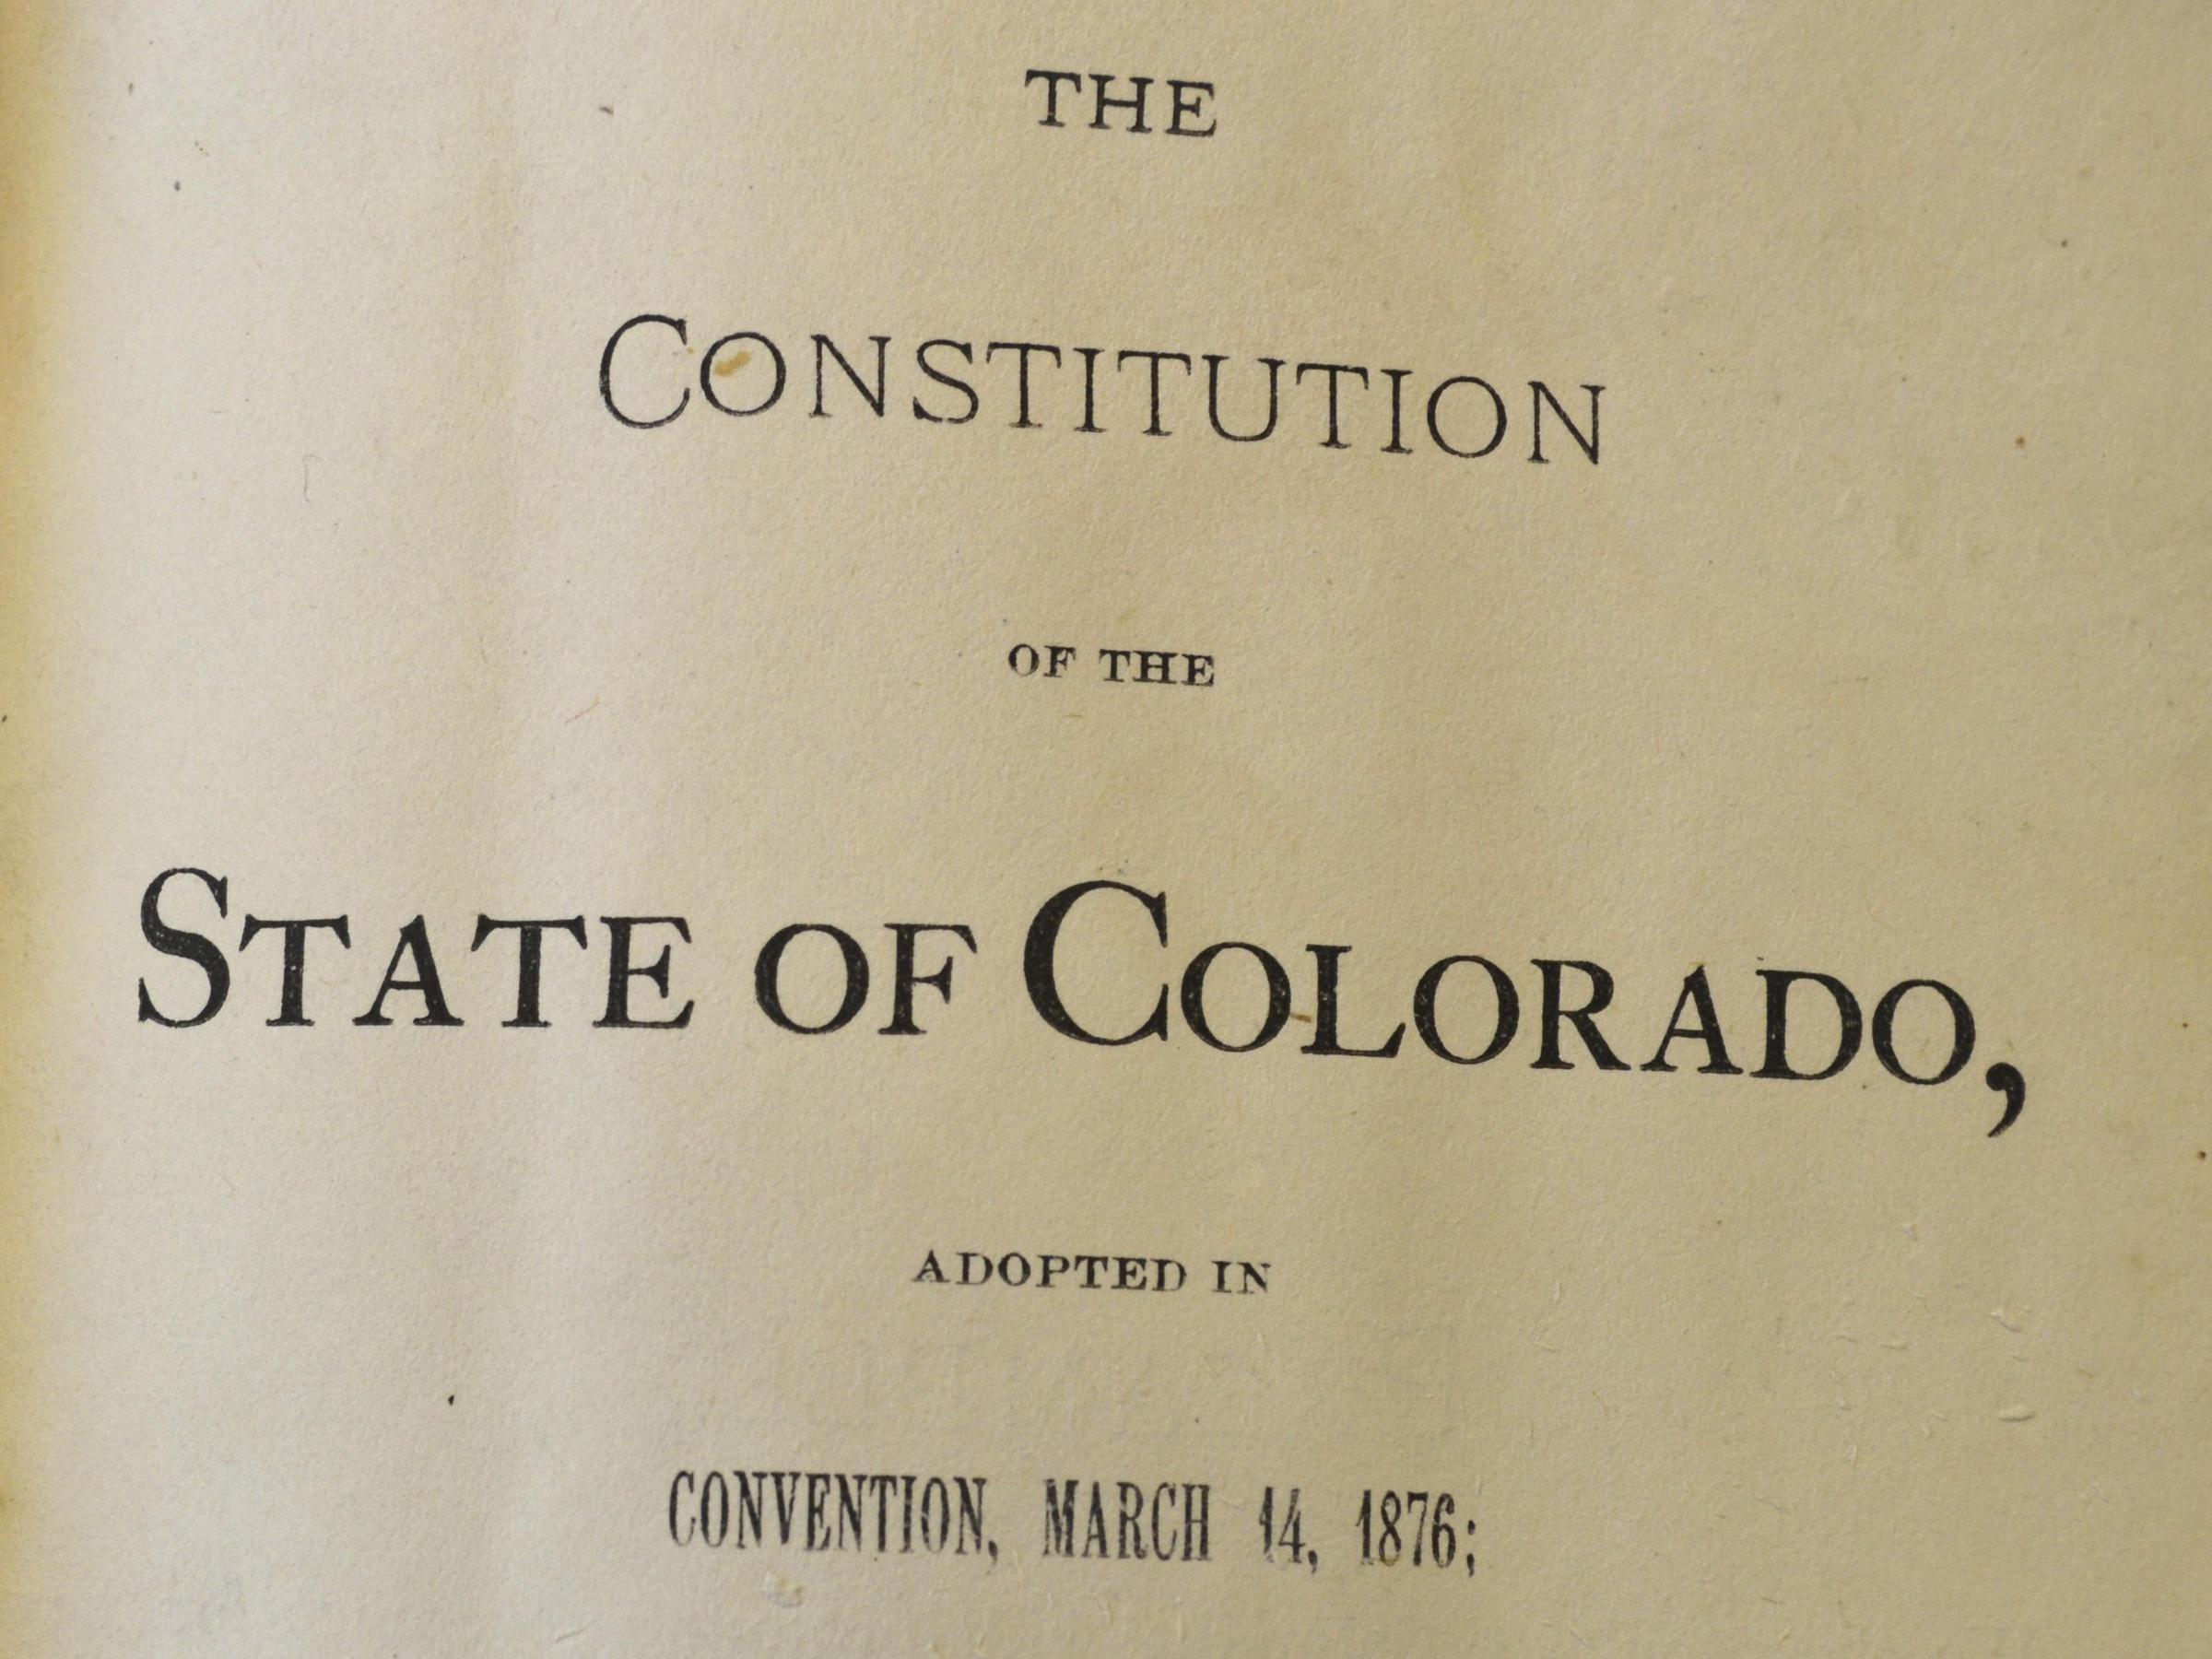 Colorado Votes To Abolish Slavery 2 Years After Similar